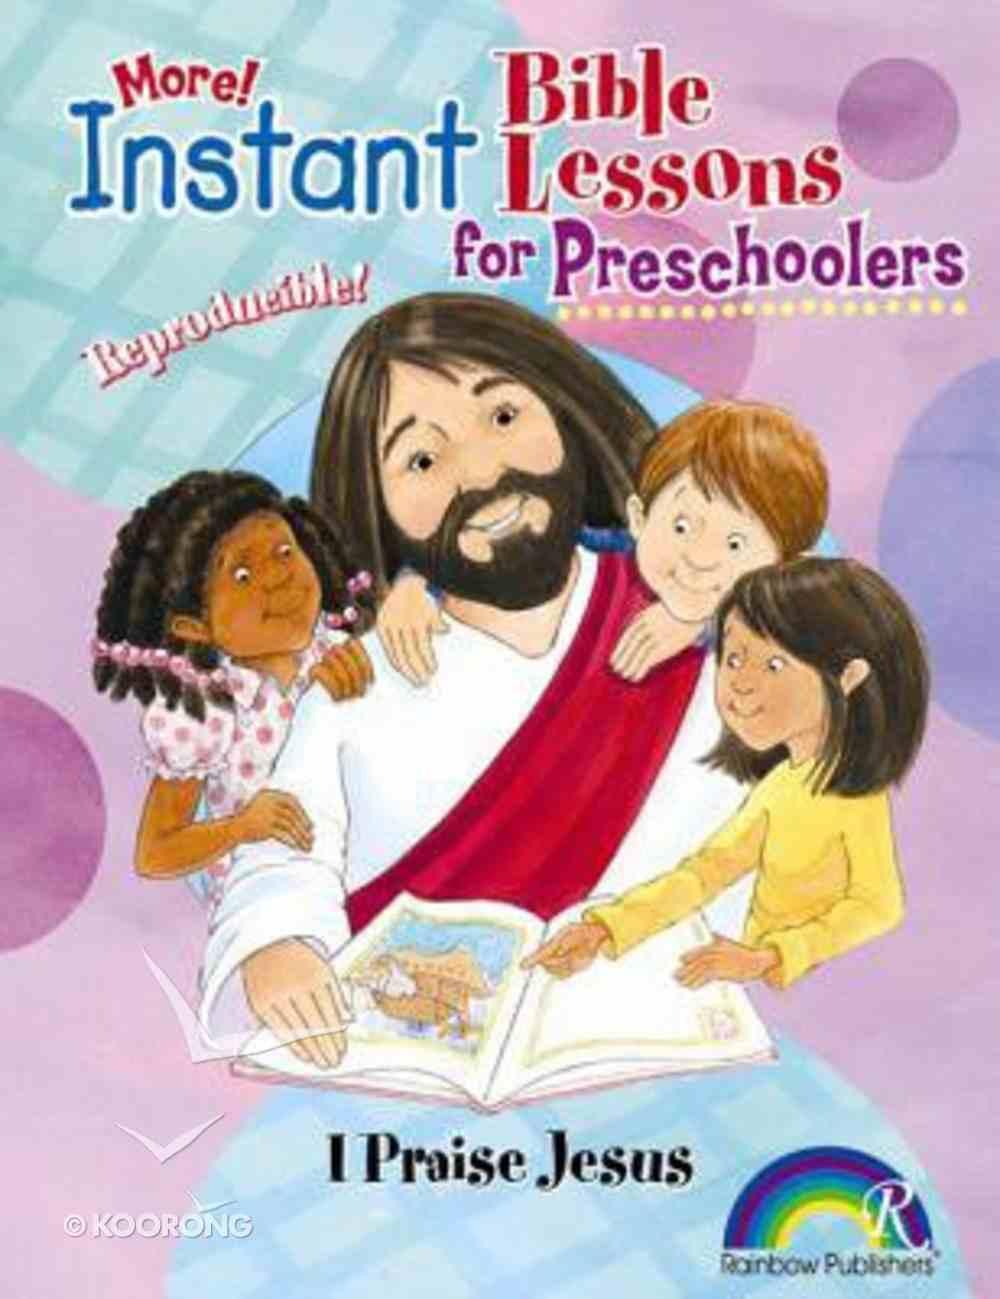 I Praise Jesus (Instant Bible Lessons Series) Paperback